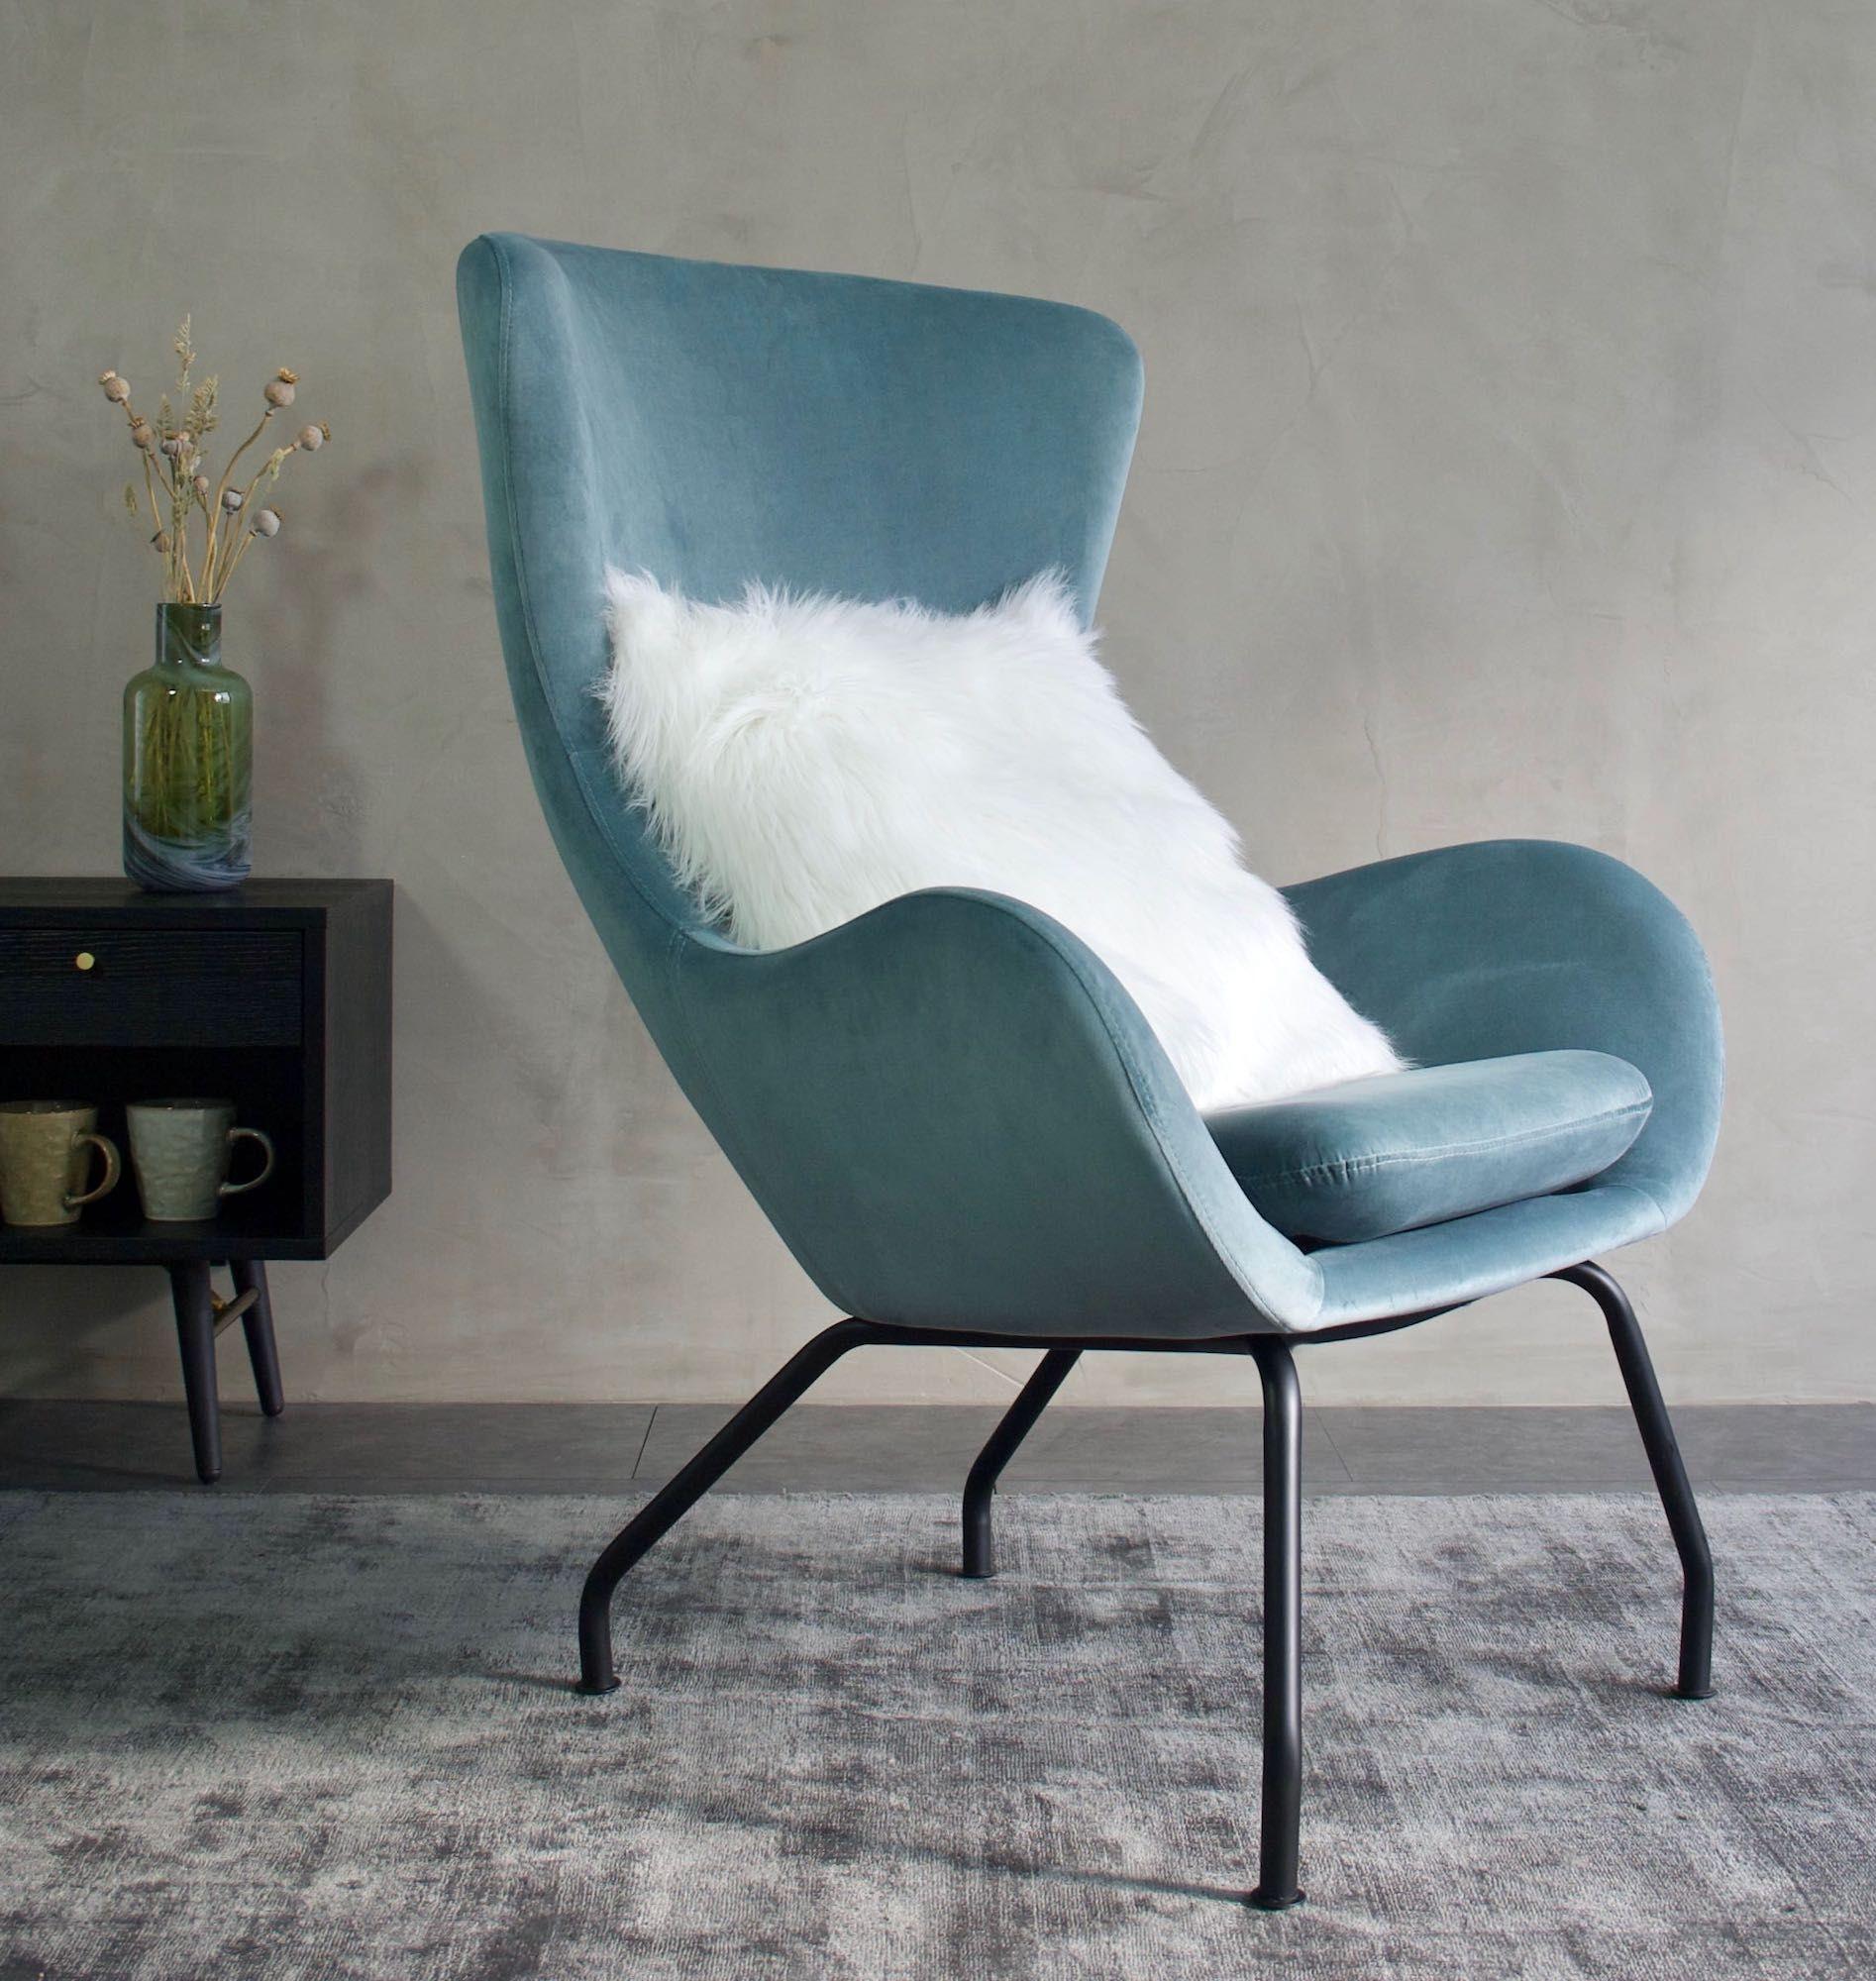 Colorcube Sofabord - Blå - 40x40 cm - Kvadratisk sofabord